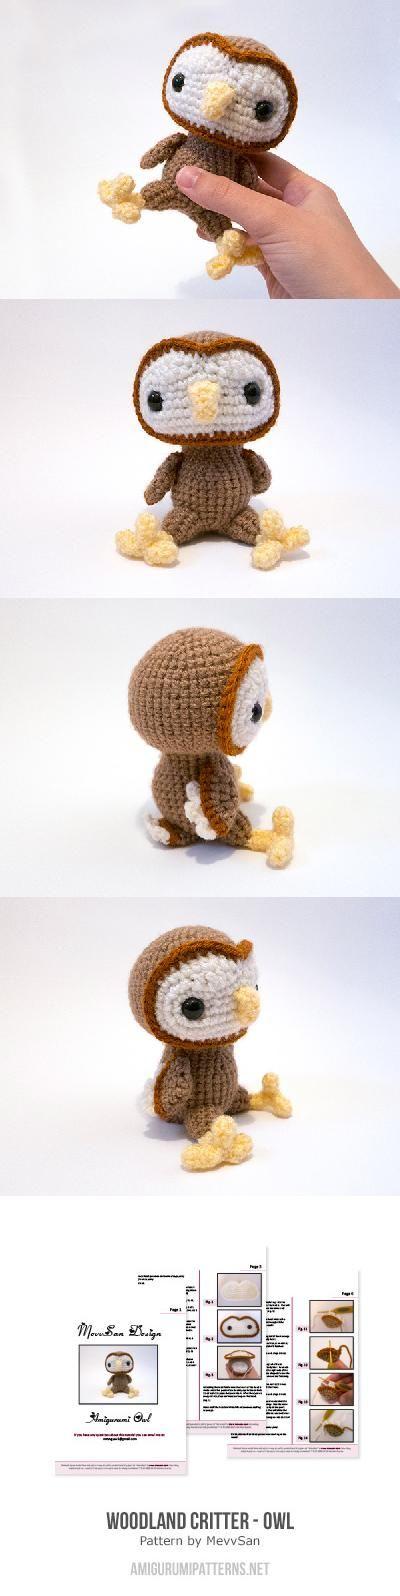 Woodland Critter - Owl Amigurumi Pattern